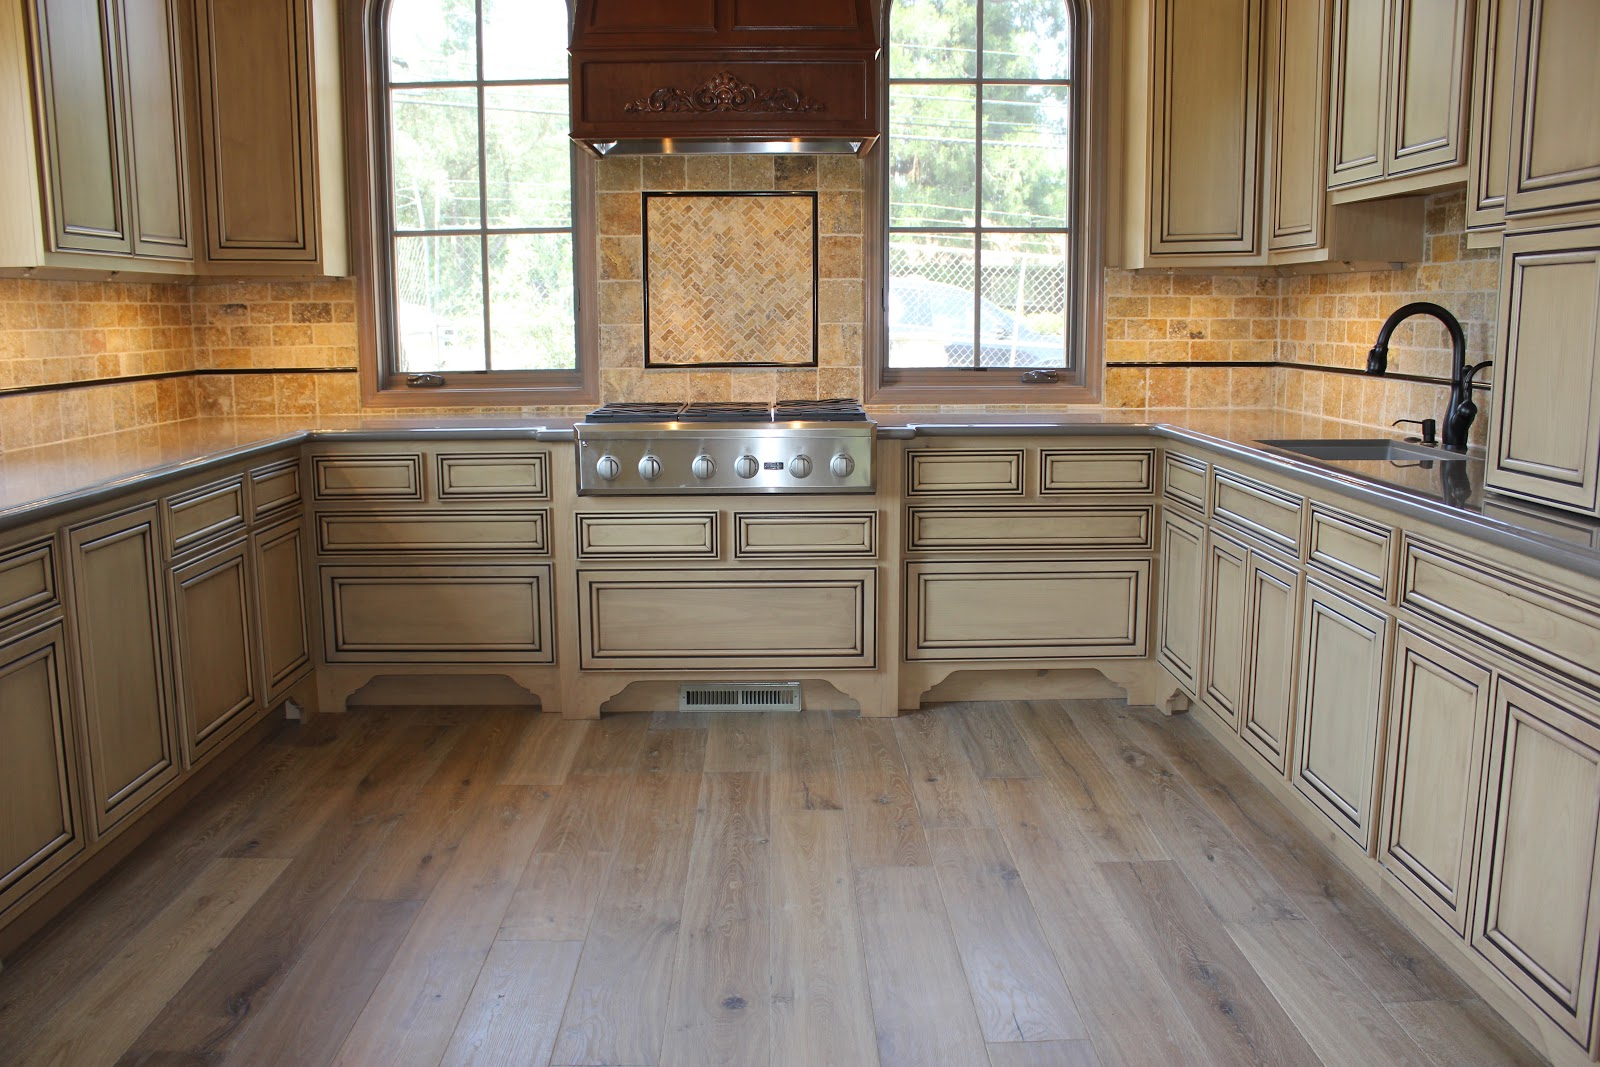 hardwood floor company wood floors in kitchen Stunning Kitchens with Dark Hardwood Floors